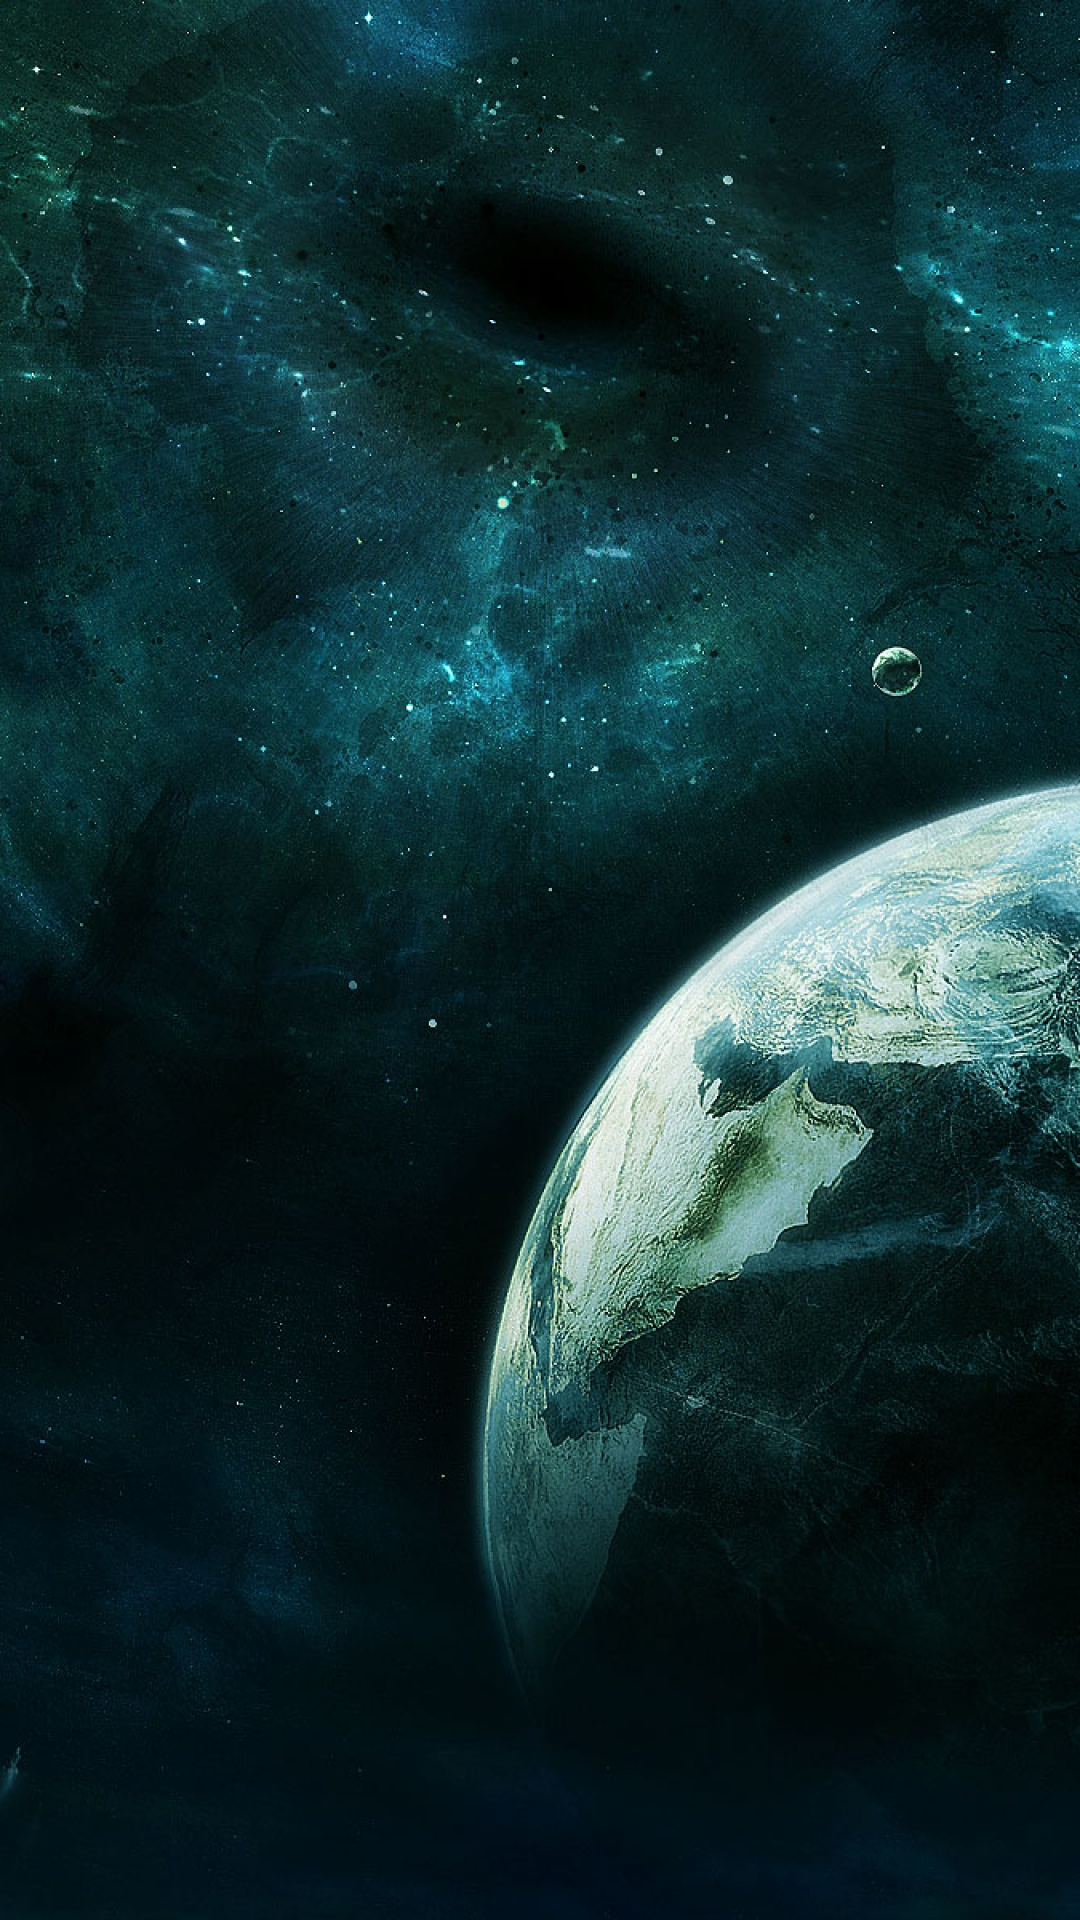 Space Wallpaper For Mobile Sf Wallpaper